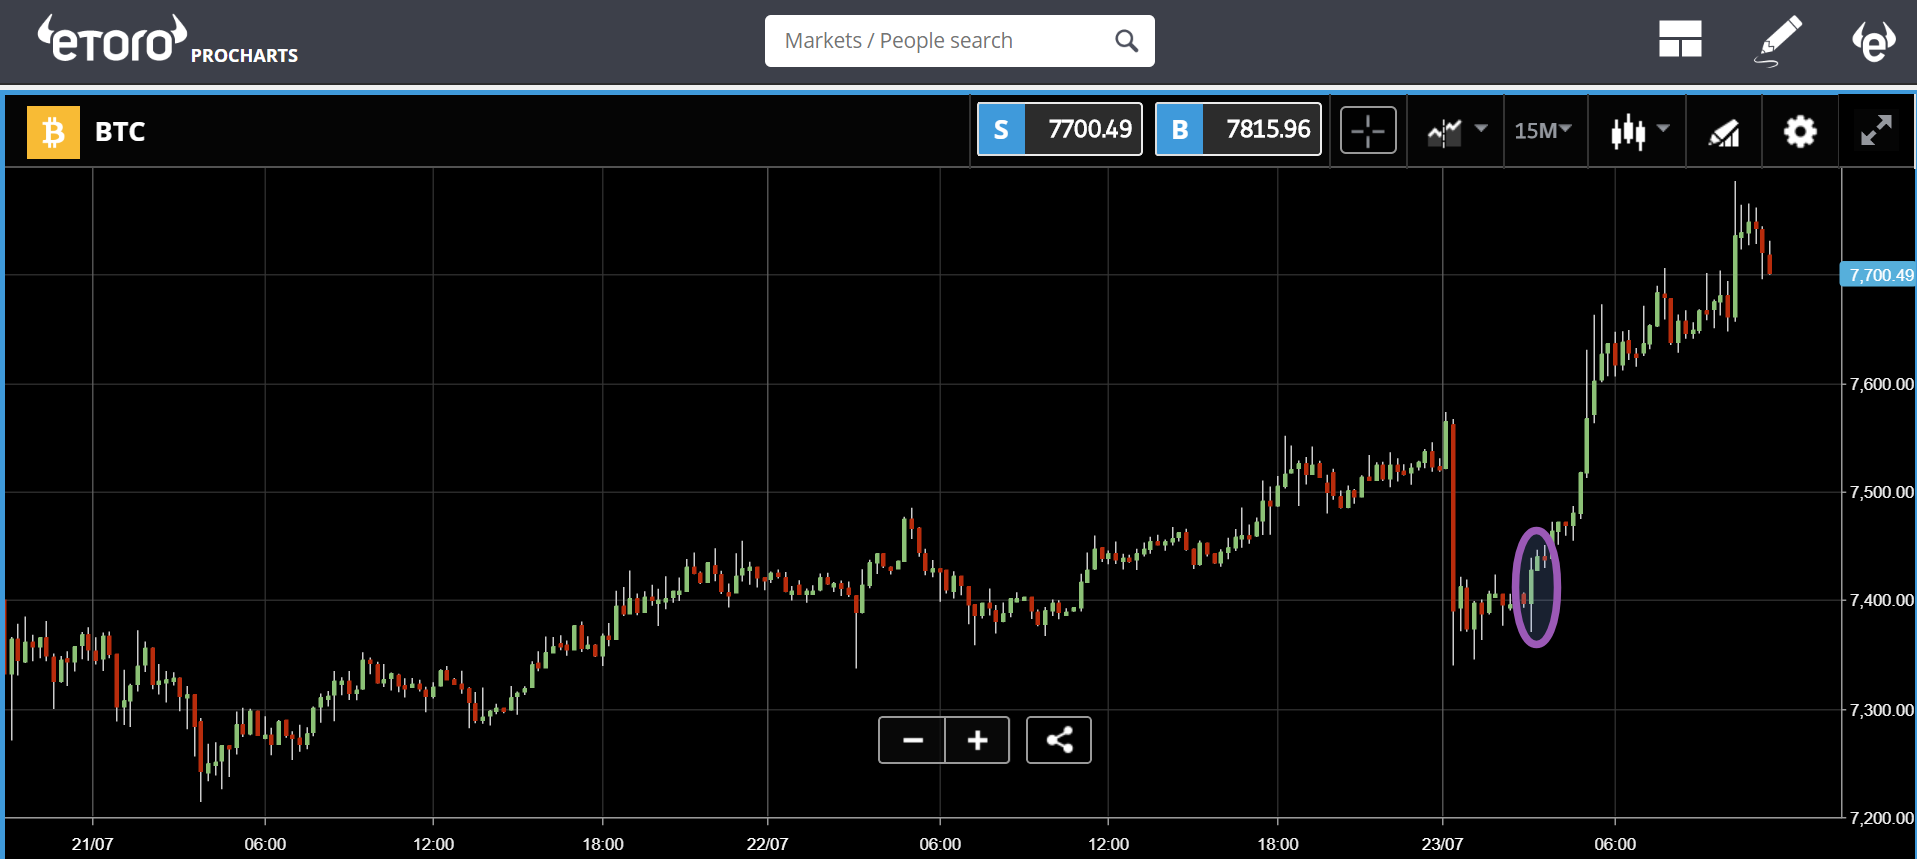 etoro, cryptocurrency, markets, trade, bonds